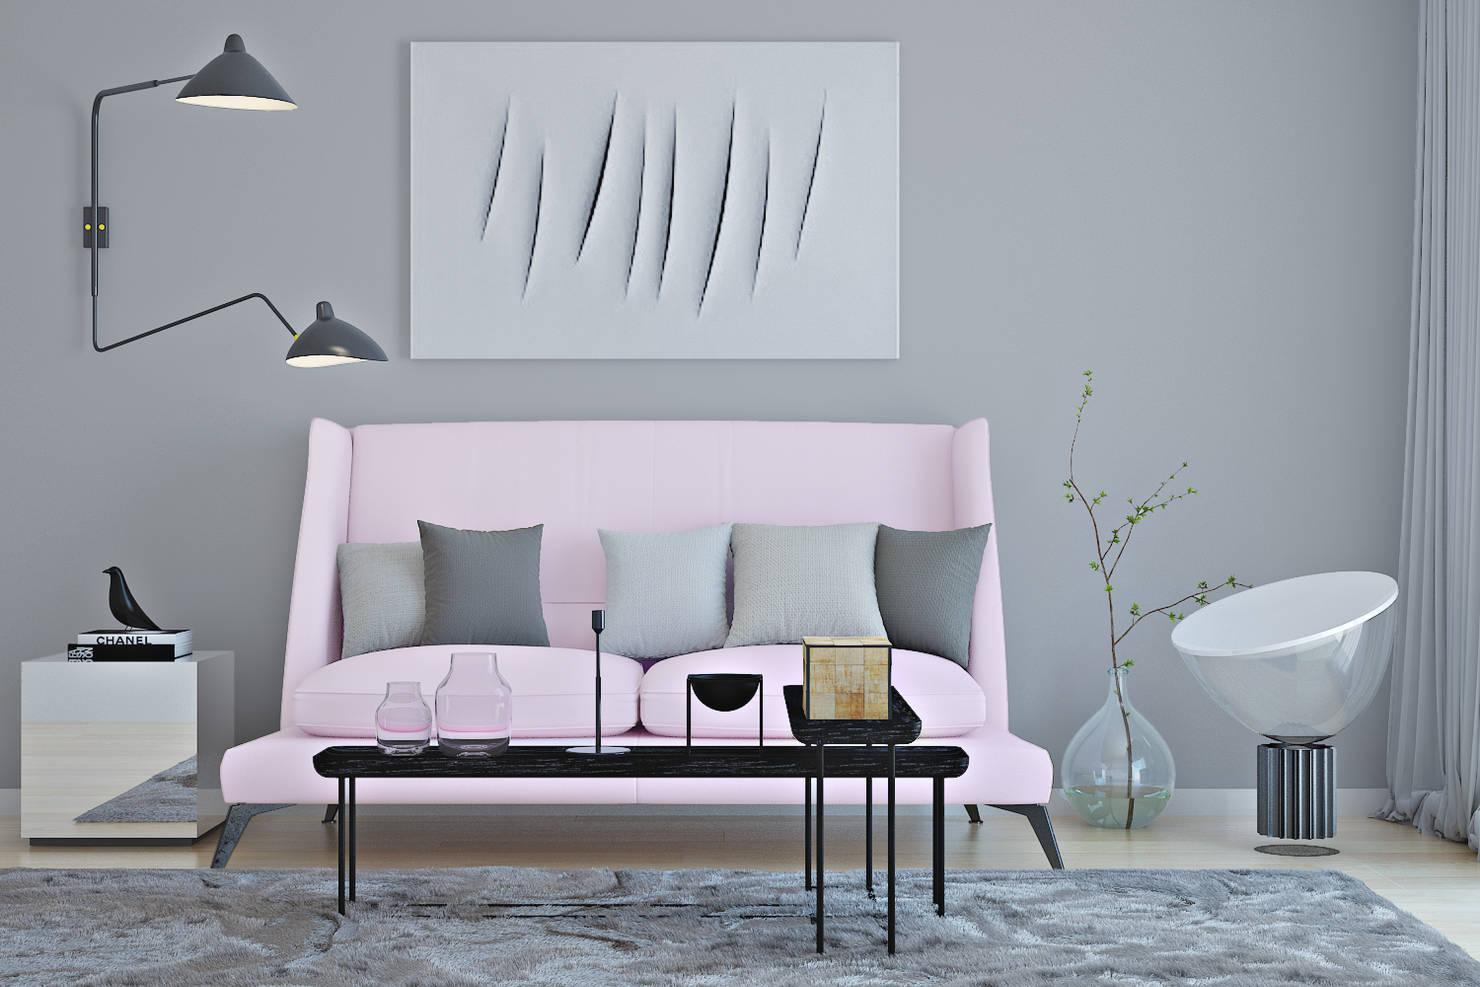 10 inspirational ideas for modern decor